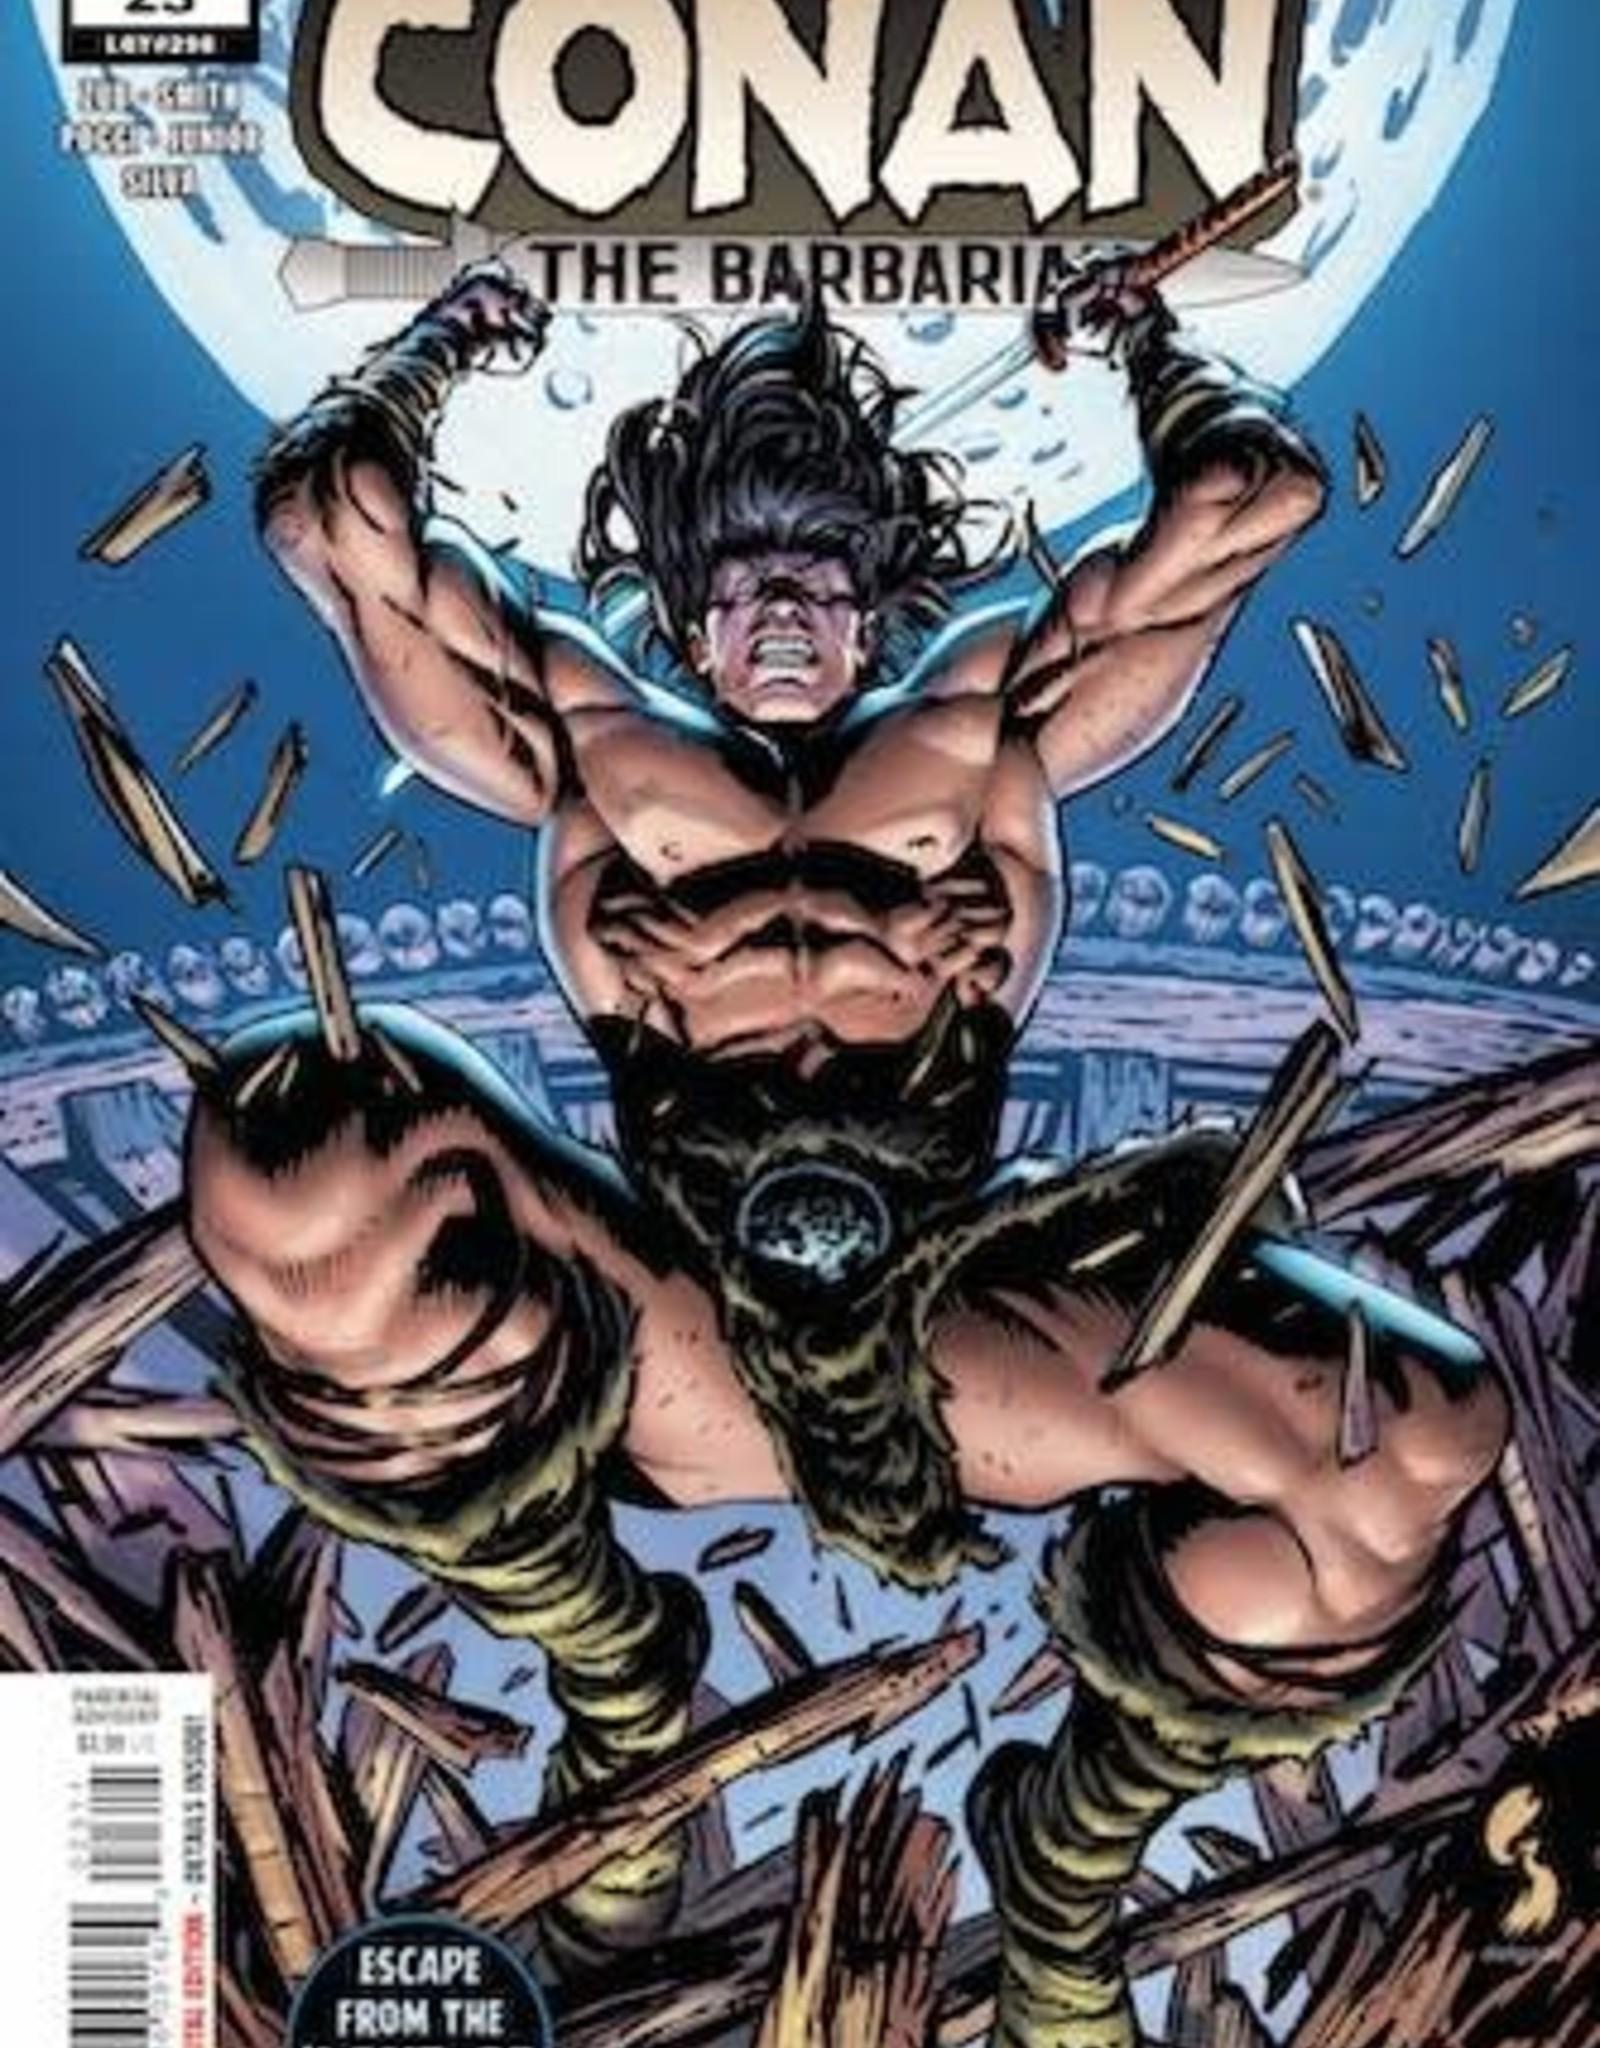 Marvel Comics Conan The Barbarian #23